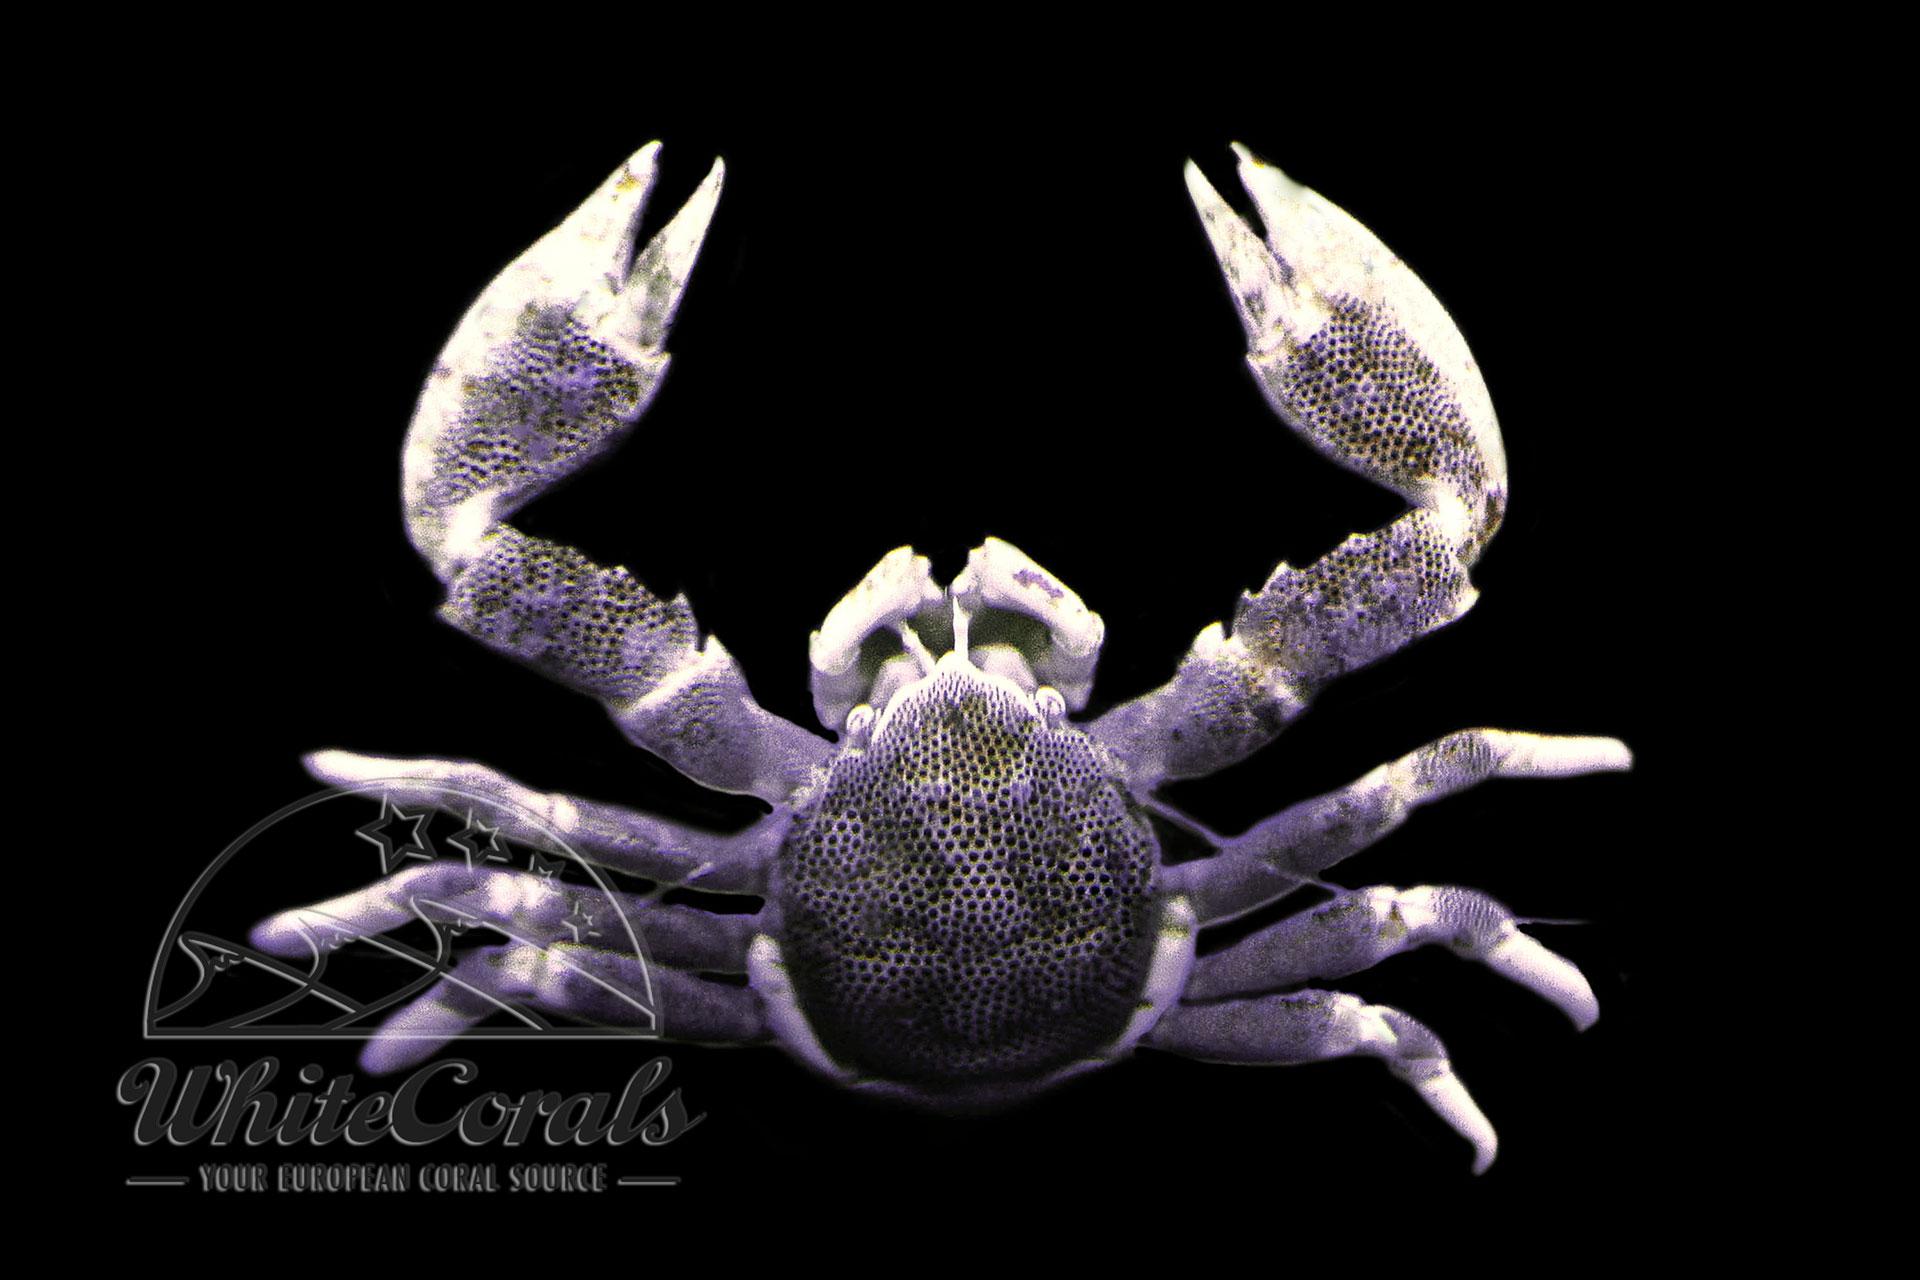 Neopetrolisthes maculatus - Anemonenkrabbe